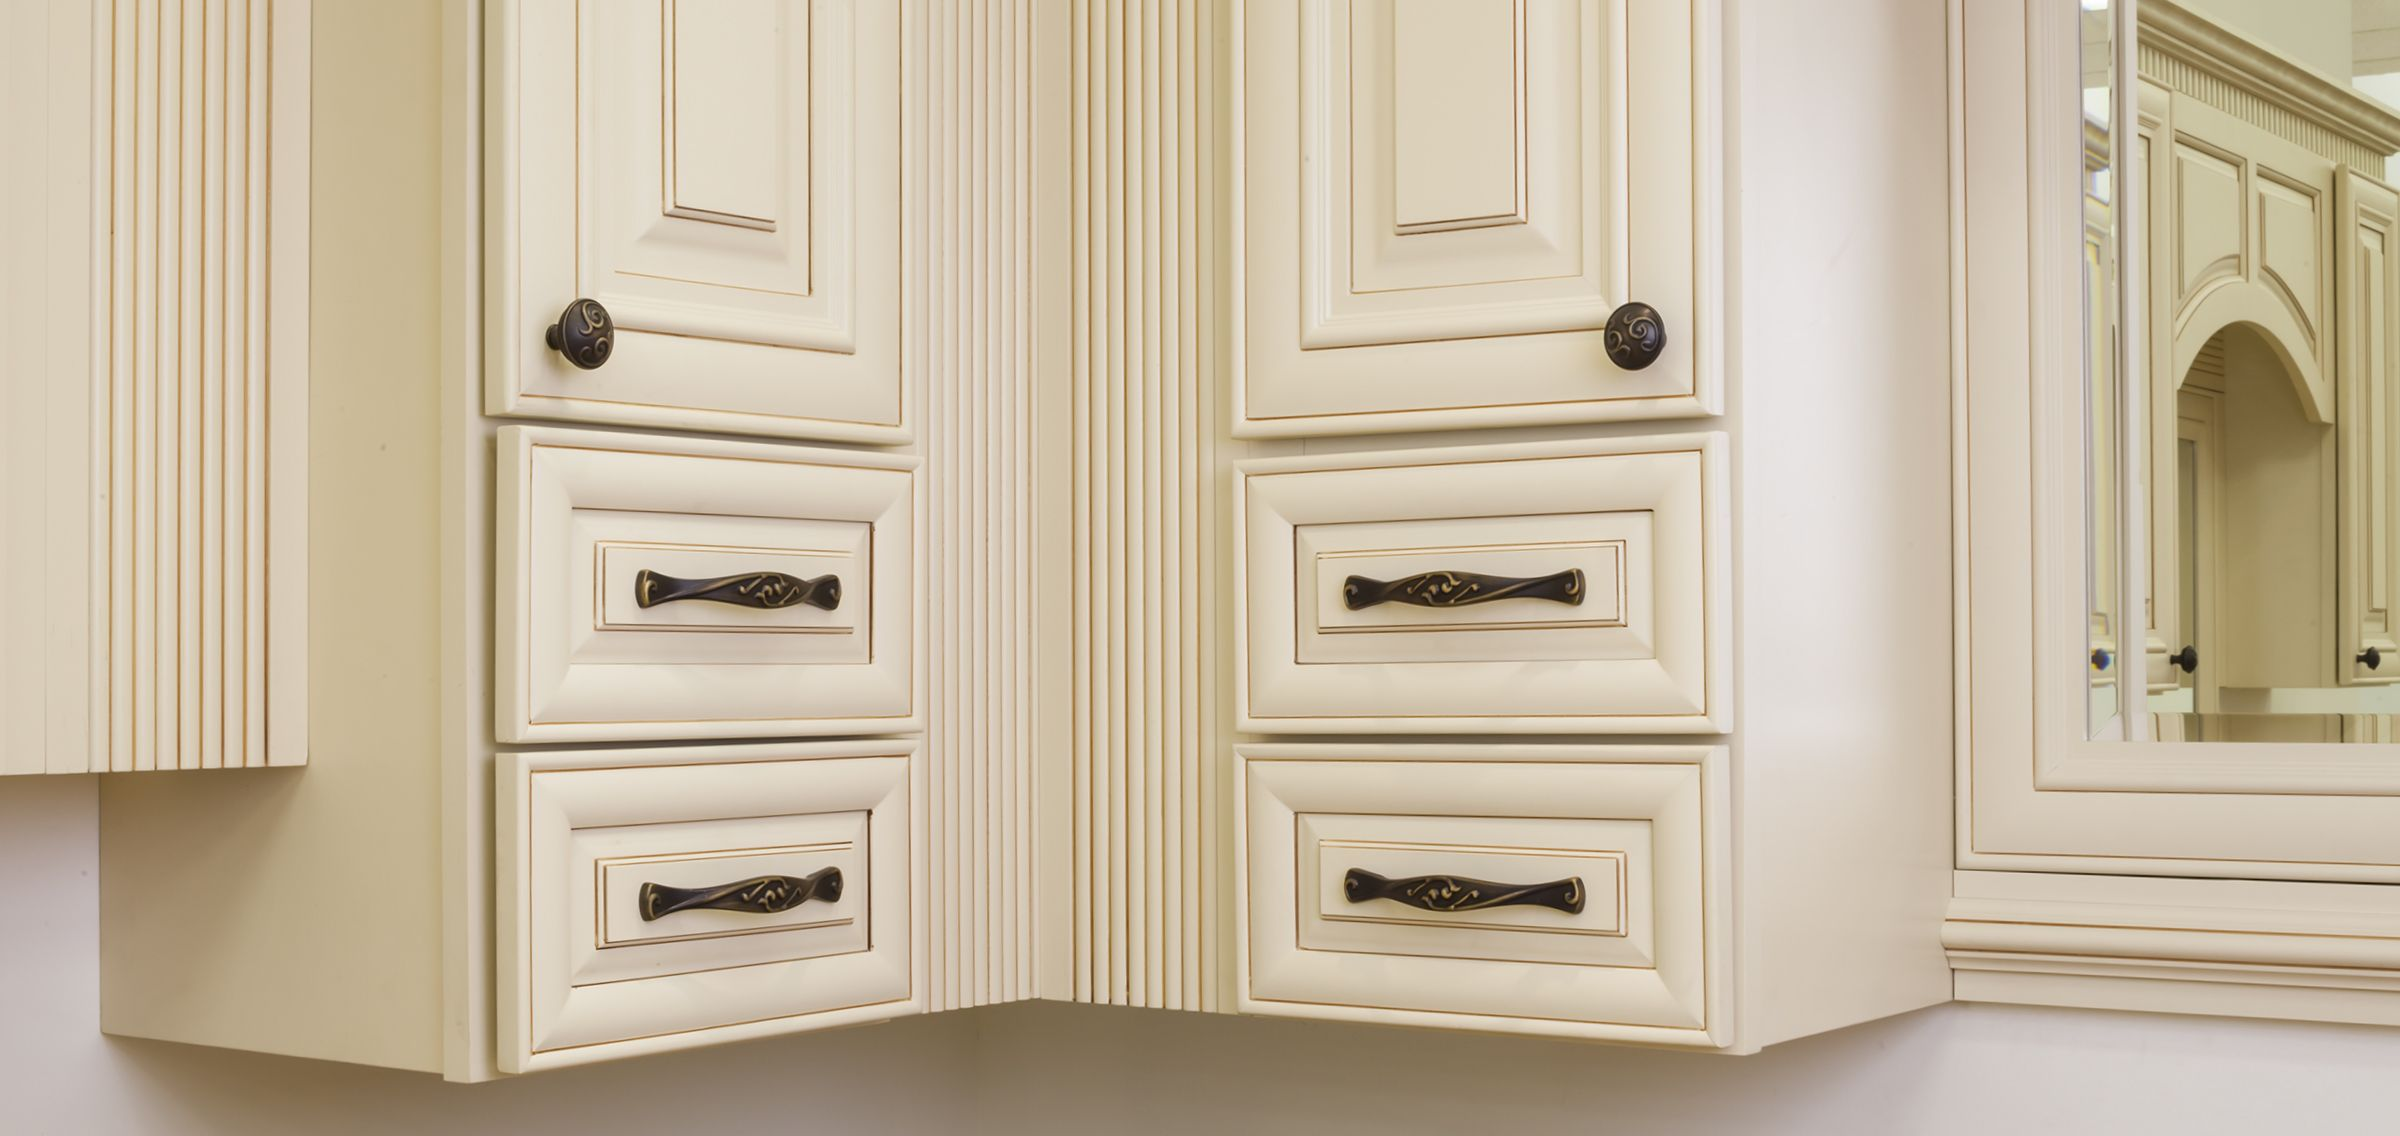 Kensington cabinet knob & pull from Jeffrey Alexander by Hardware ...